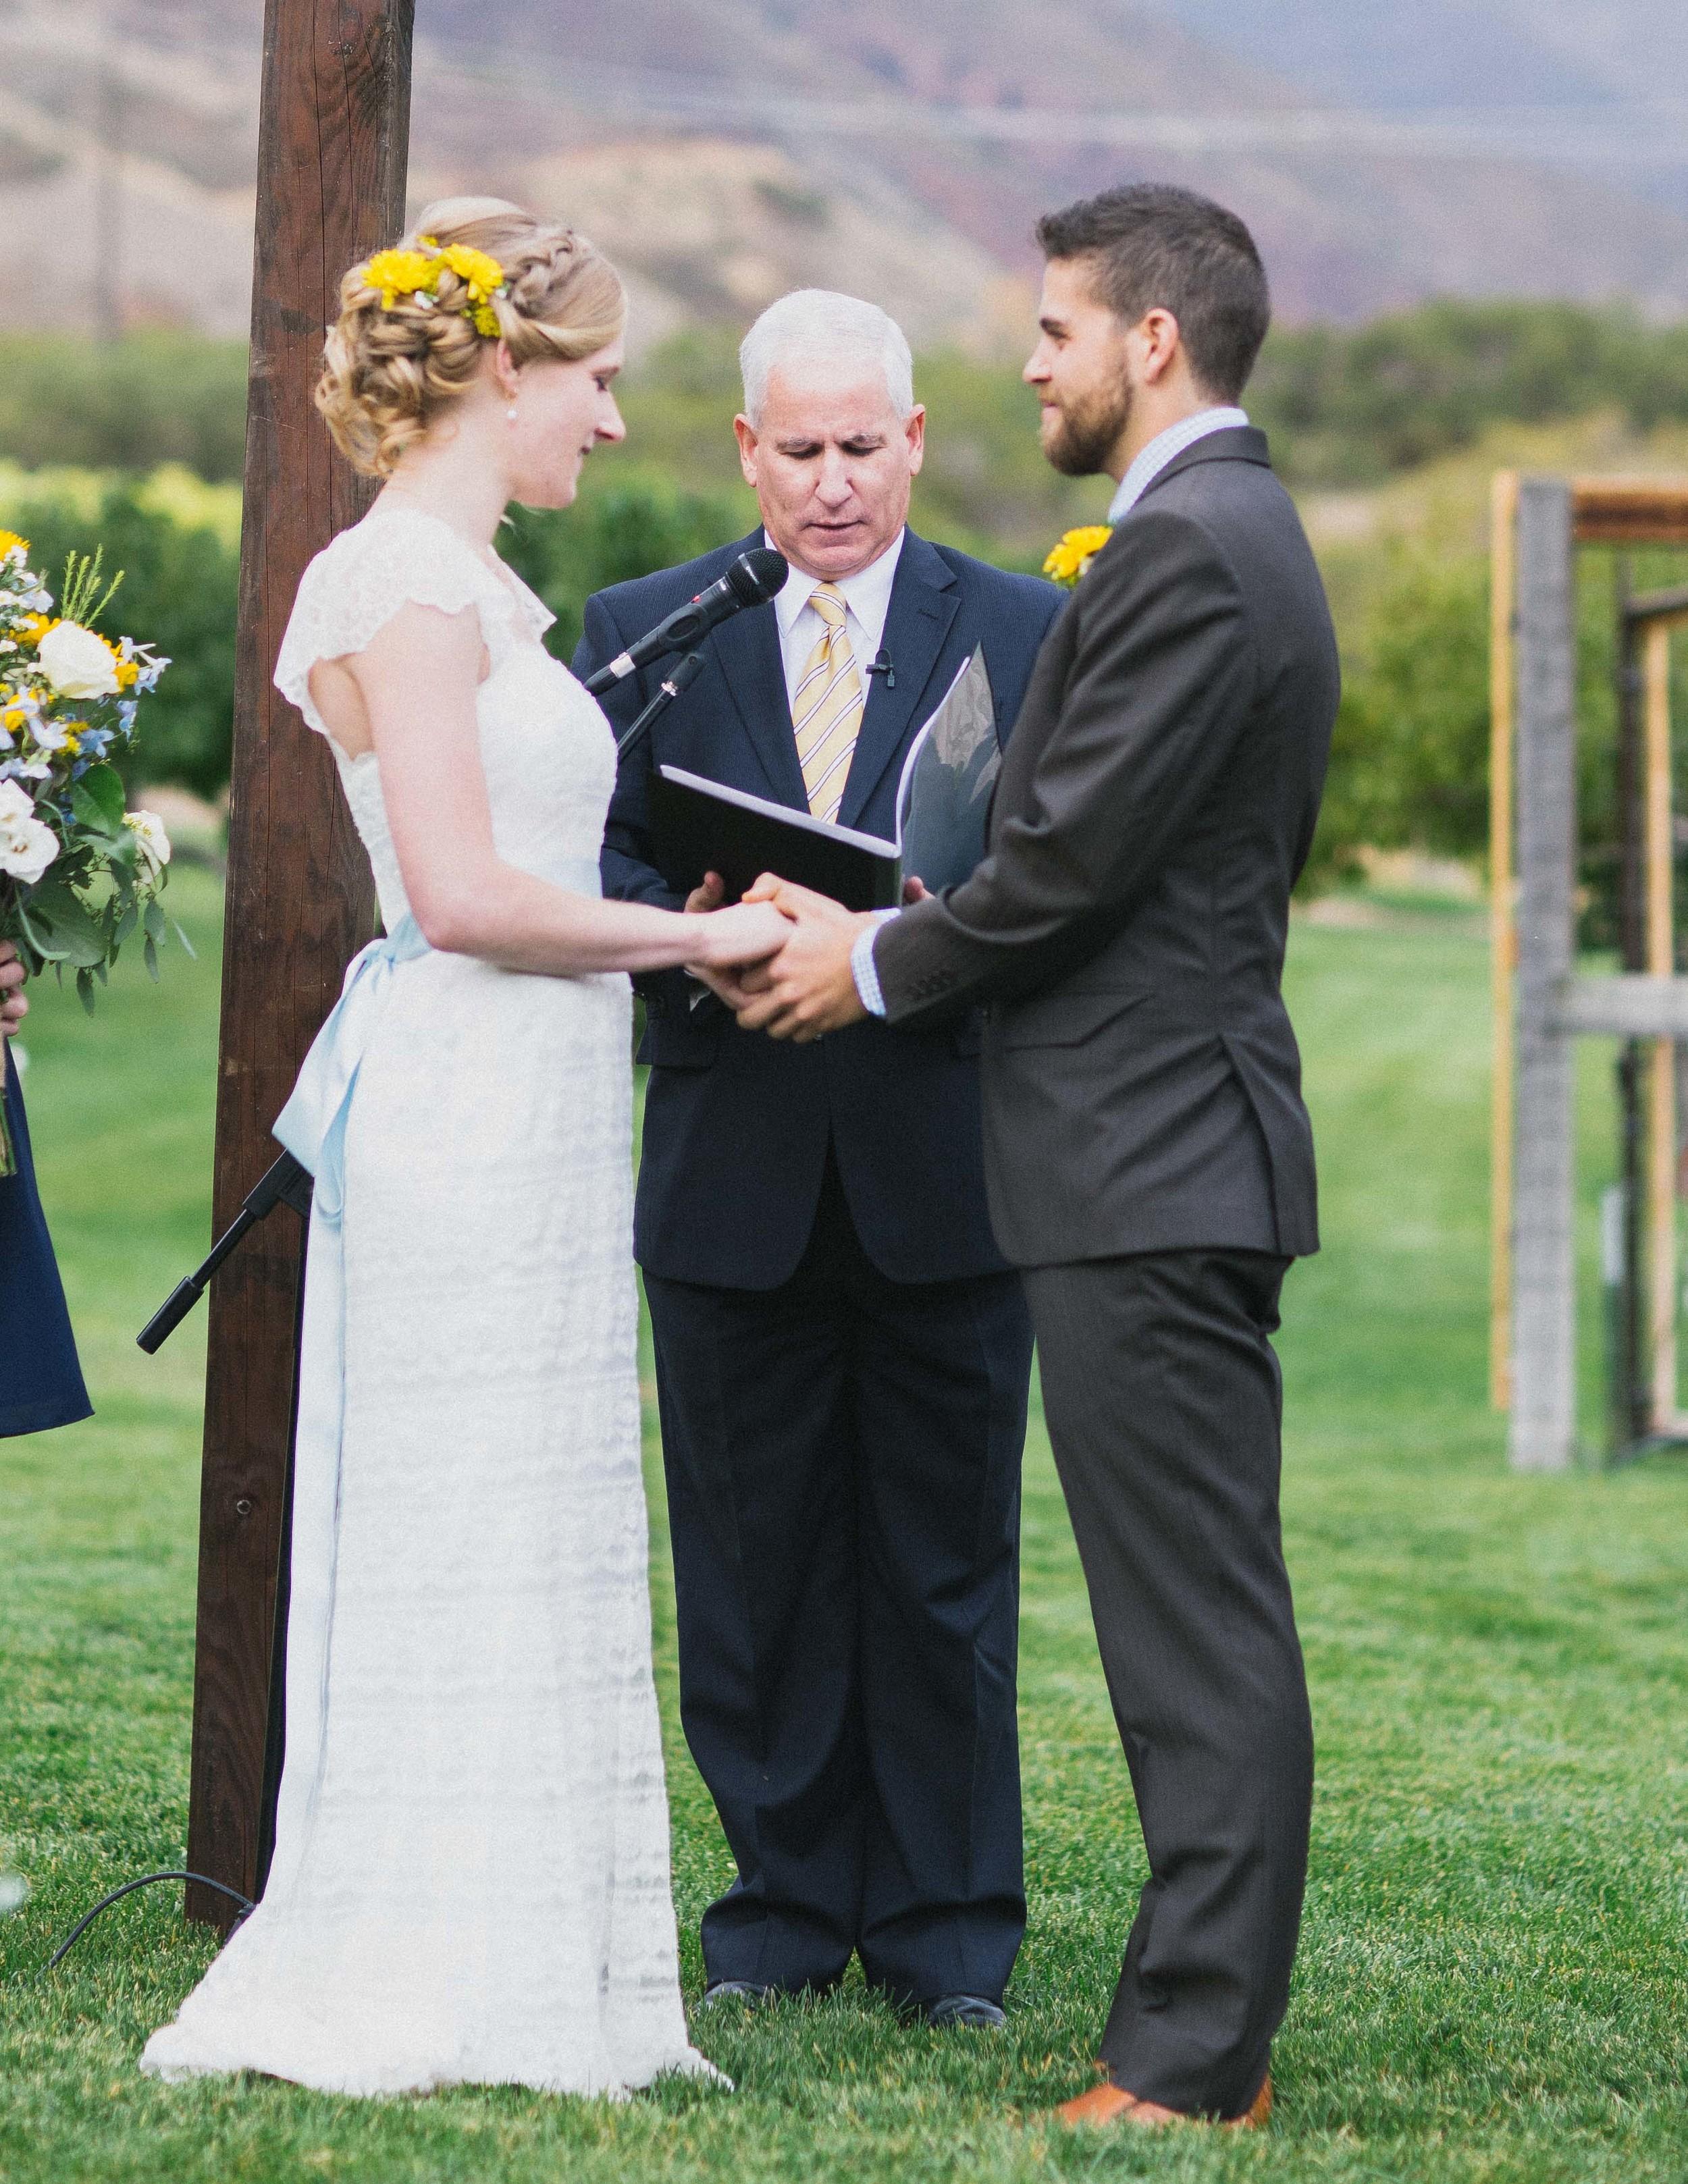 Salt-Lake-City-Utah-Wedding-Photographer-37.jpg